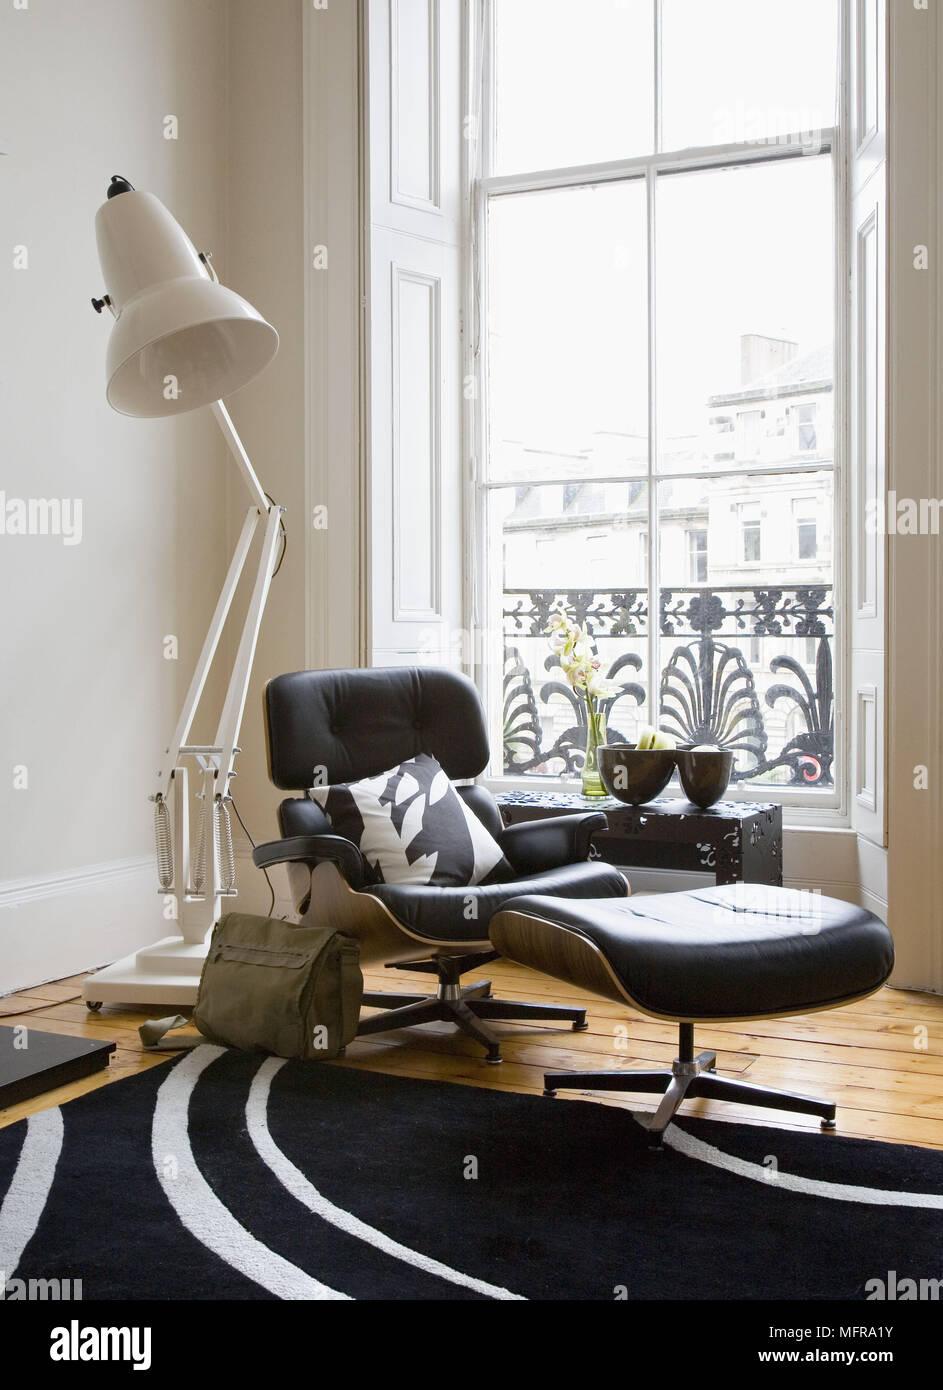 Übergroße Anglepoise Stehleuchte Hinter Eames Lounge Chair Vor Fenster